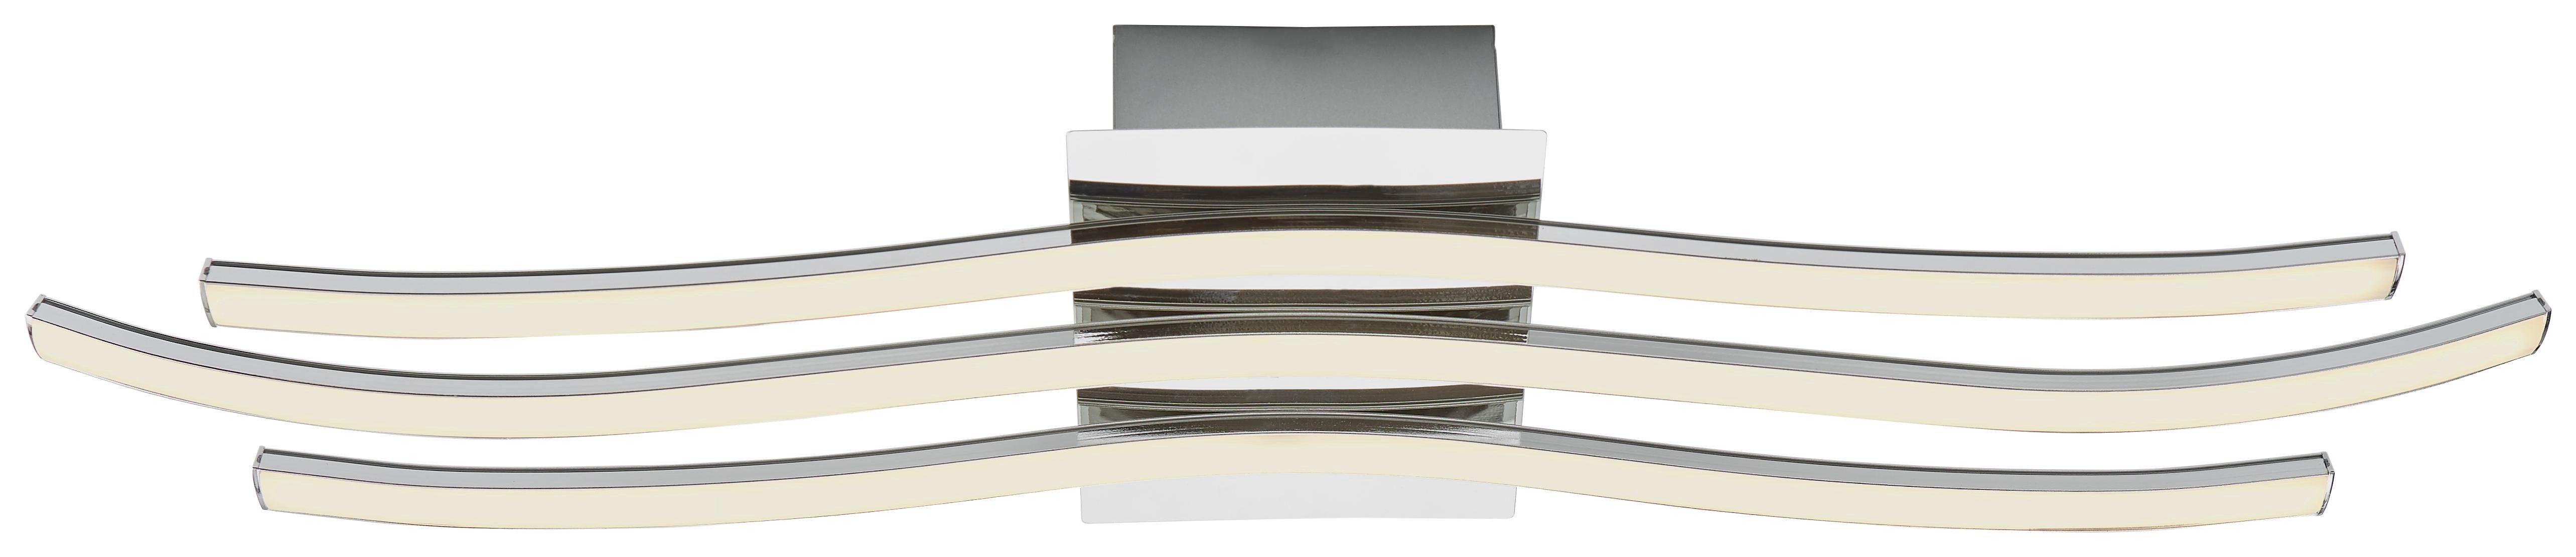 LED-TAKLAMPA - kromfärg, Design, metall/plast (60/15,5/6,5cm) - Novel